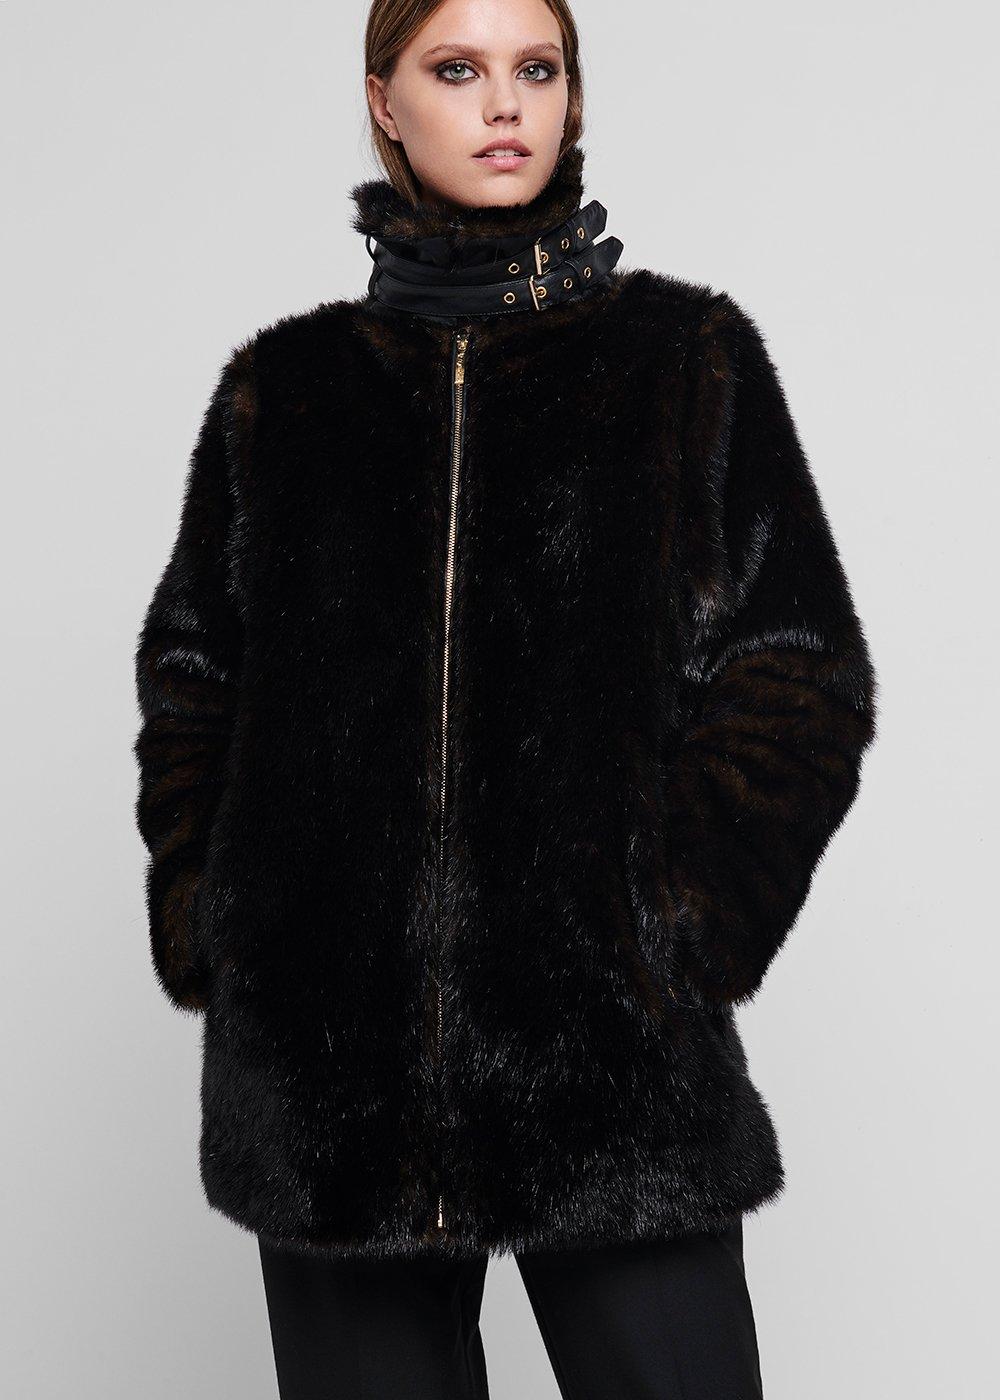 Beaver - effect faux fur coat